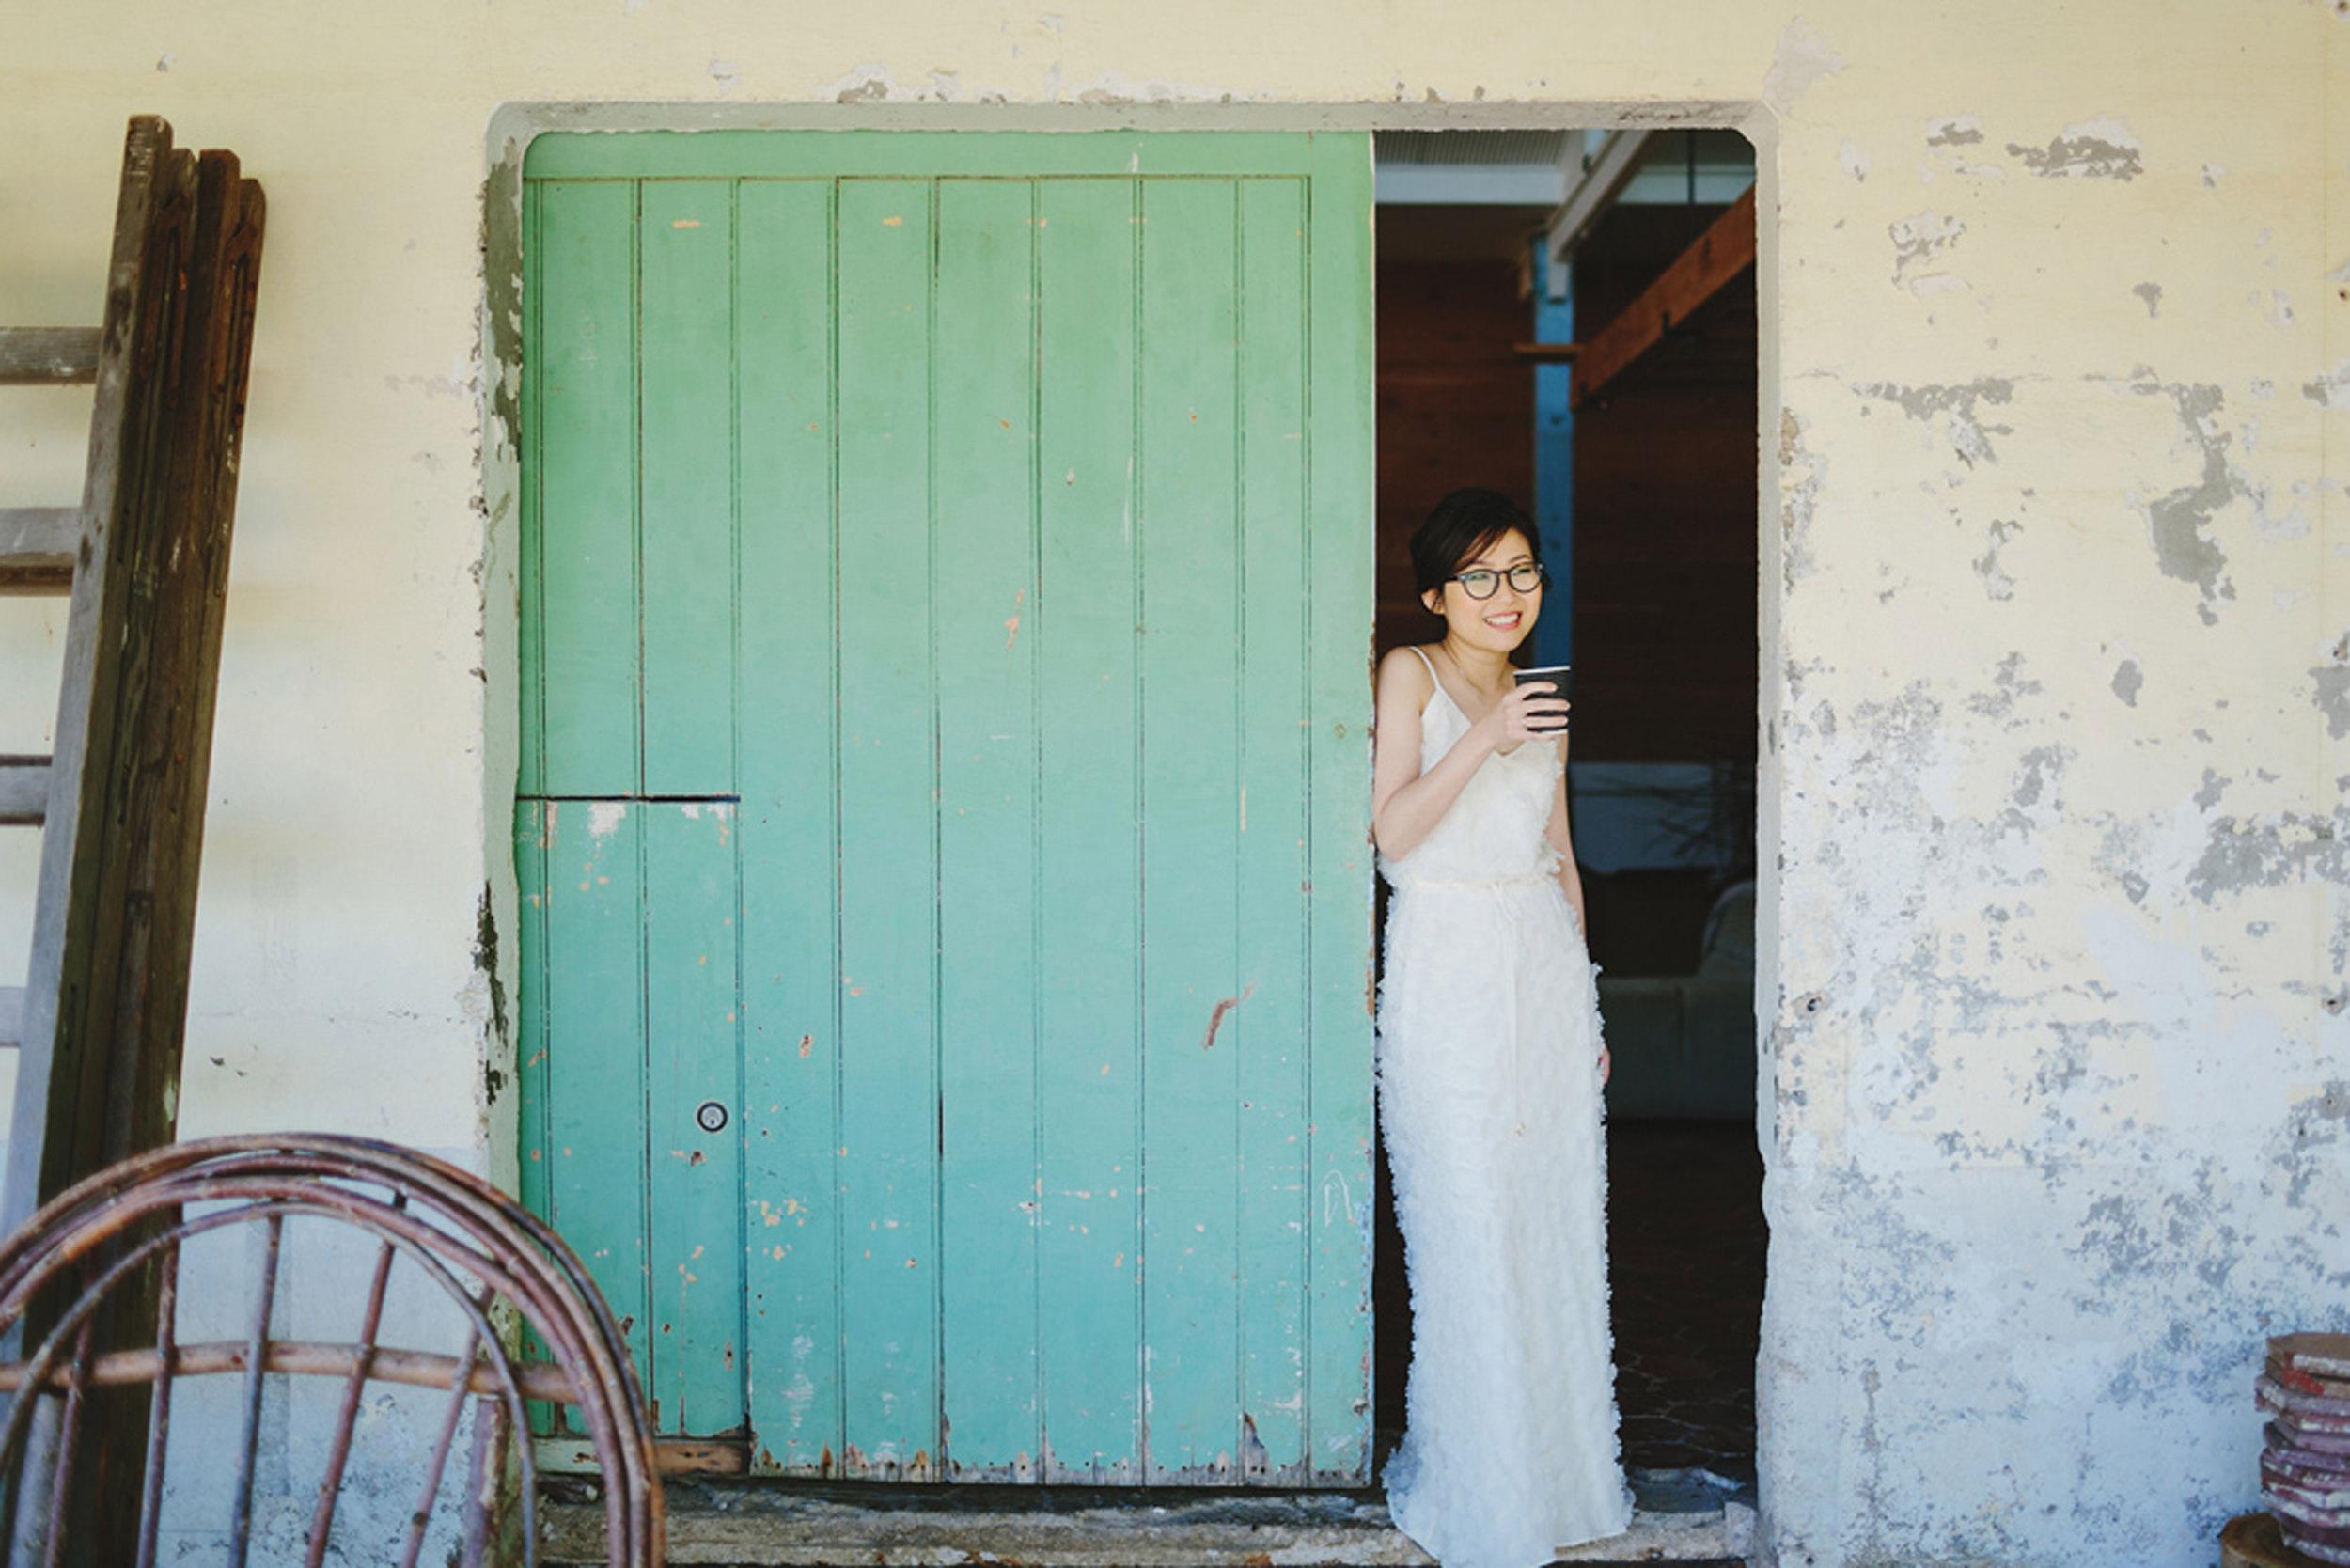 Butterland_Wedding_Anthony_Rachel10.JPG